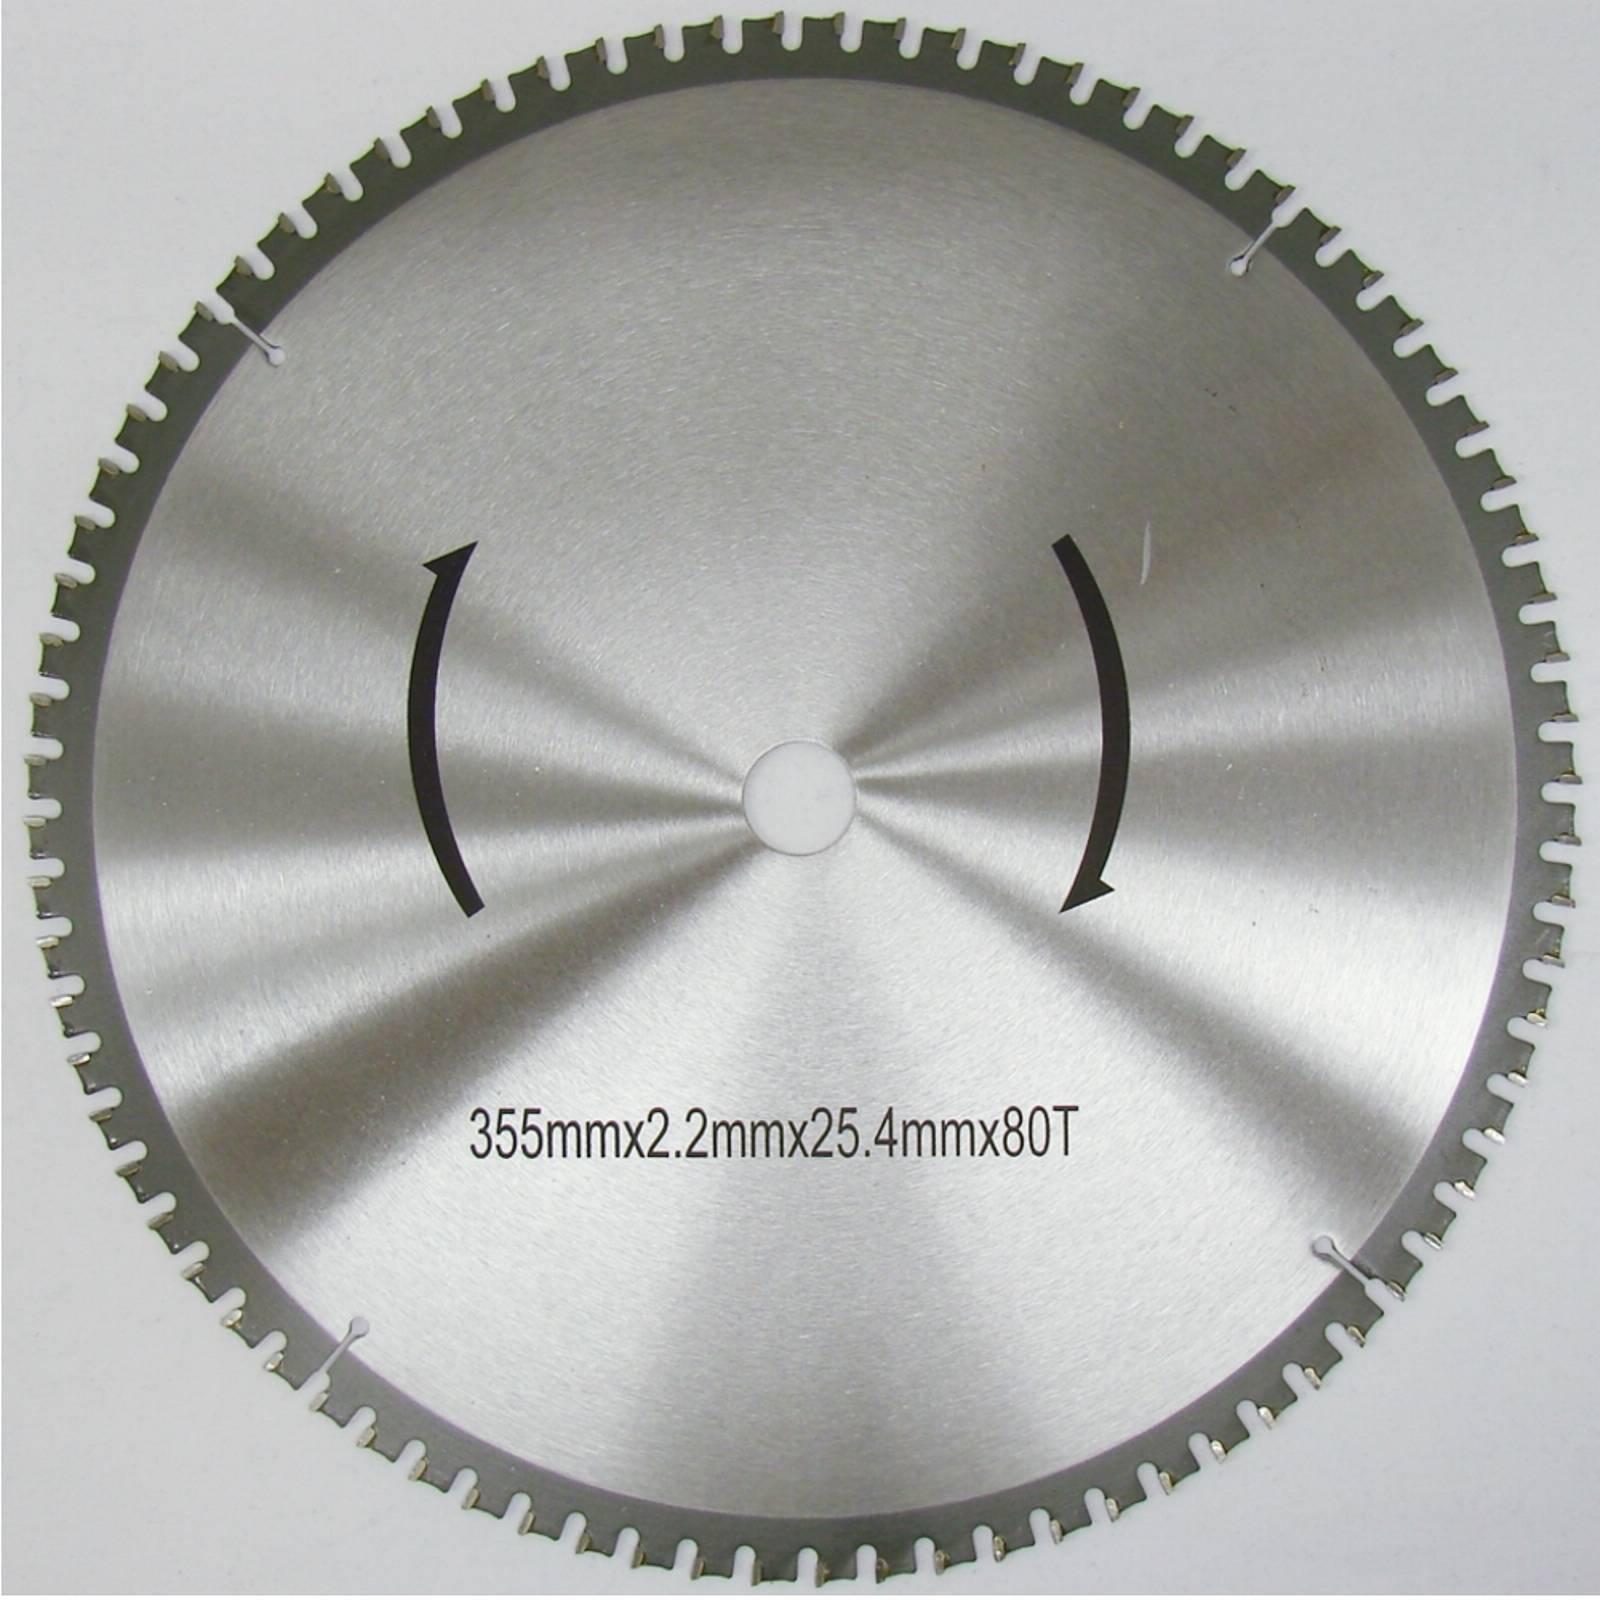 Metall-KREISSÄGEBLATT 355mm für Eisen Alu Hartkunststoff PVC etc NEU